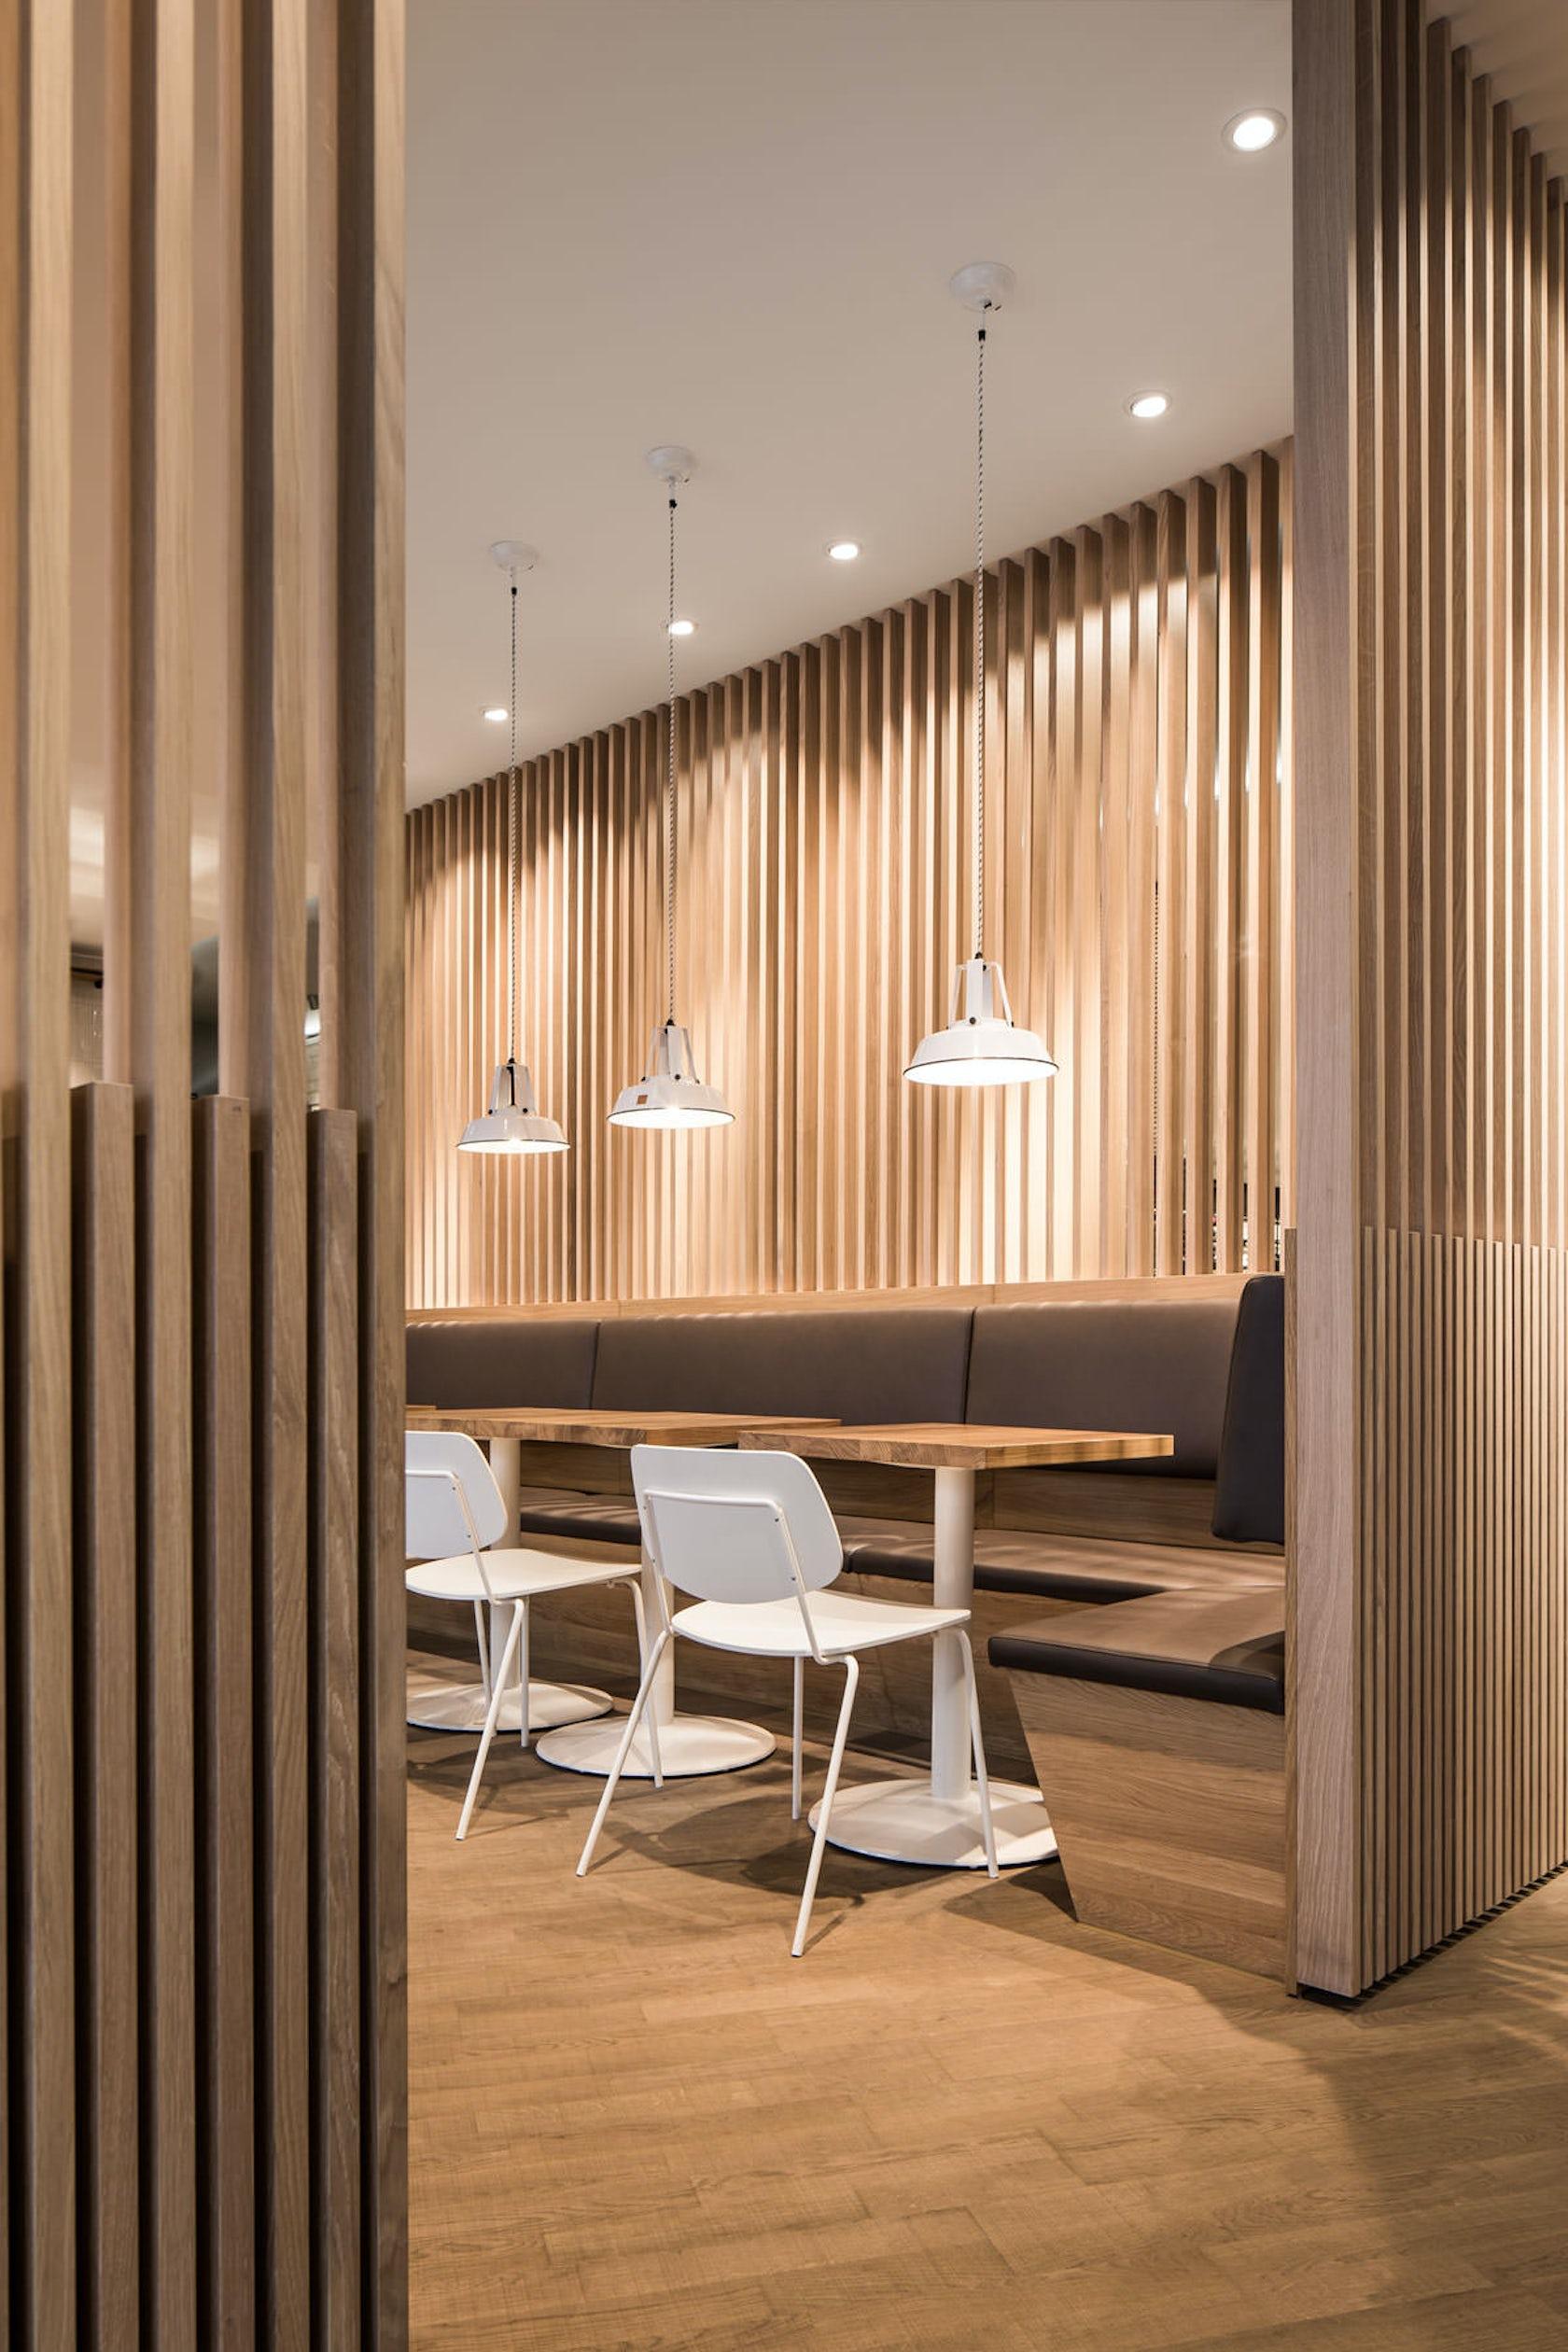 interieur mit holz lamellen haus design bilder möbelideen cool ...